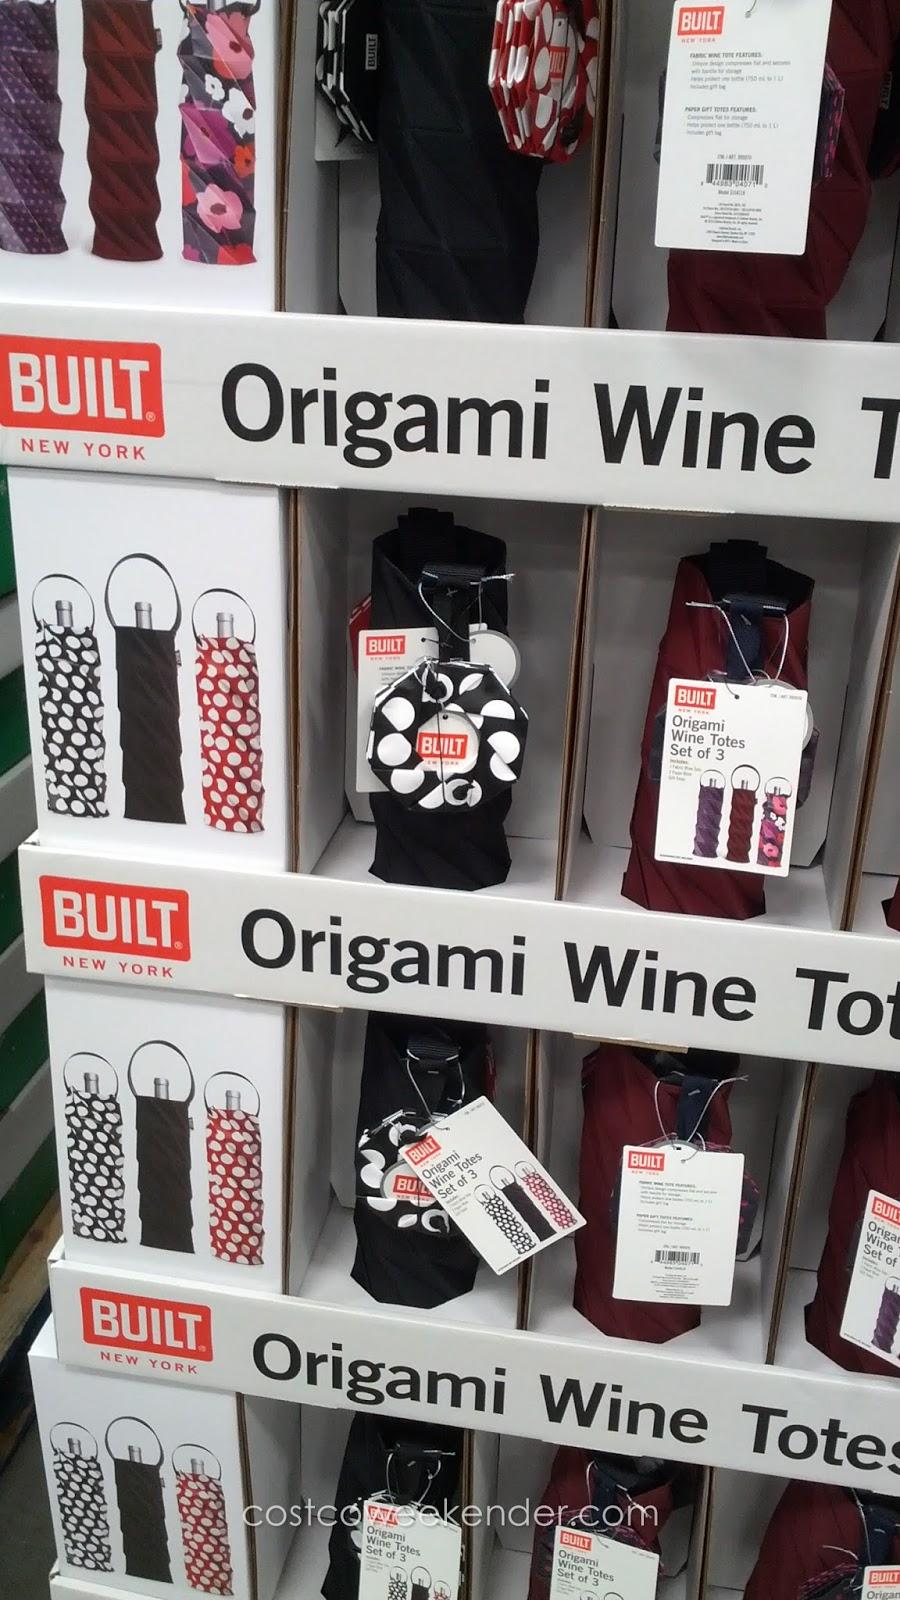 built new york origami wine totes set of 3 costco weekender